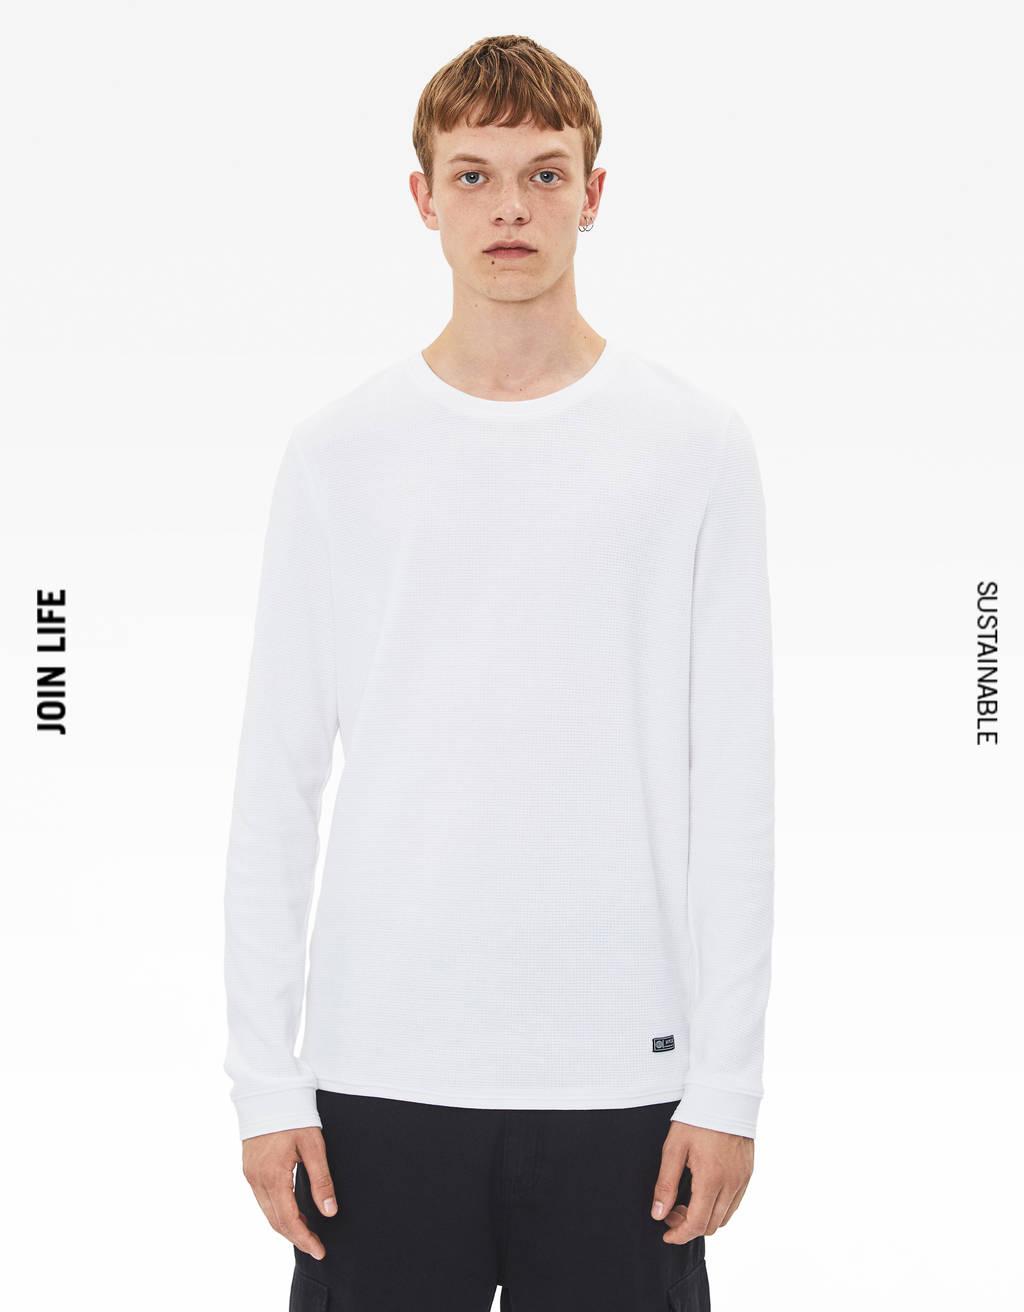 Džemper s uzrokom vafla